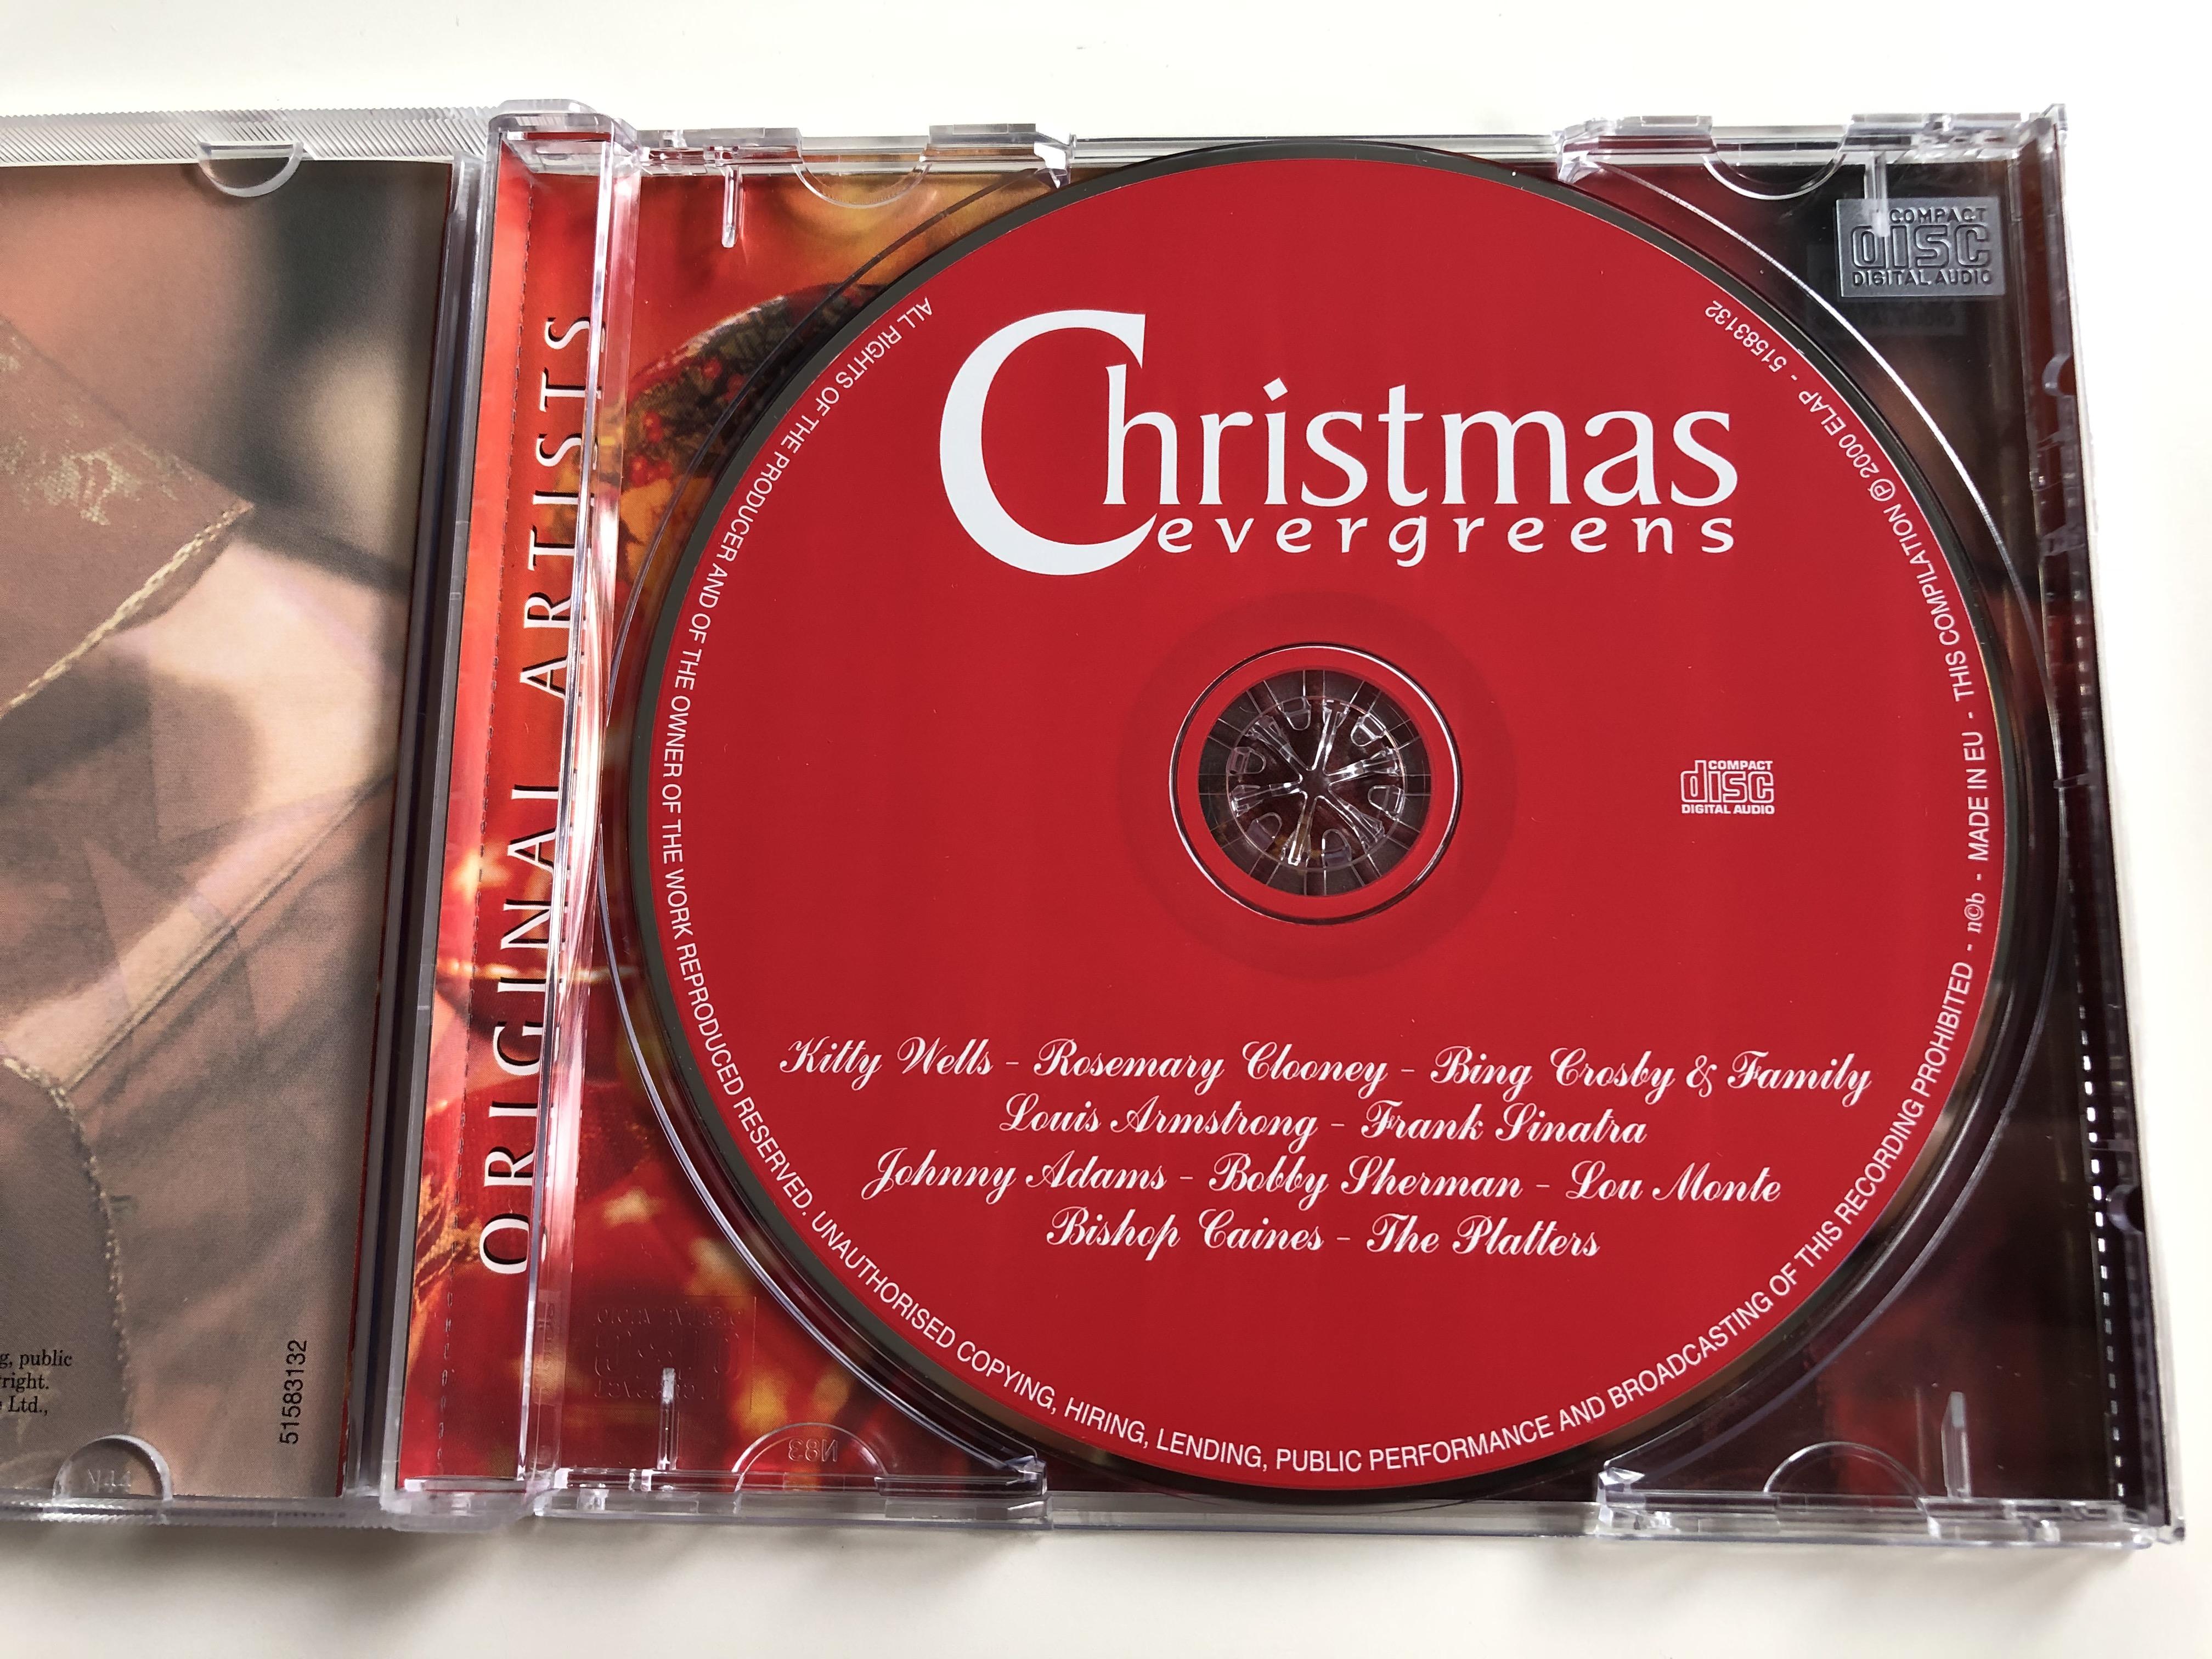 christmas-evergreens-frank-sinatra-bing-crosby-louis-armstrong-the-platters-elap-audio-cd-2000-51583132-4-.jpg